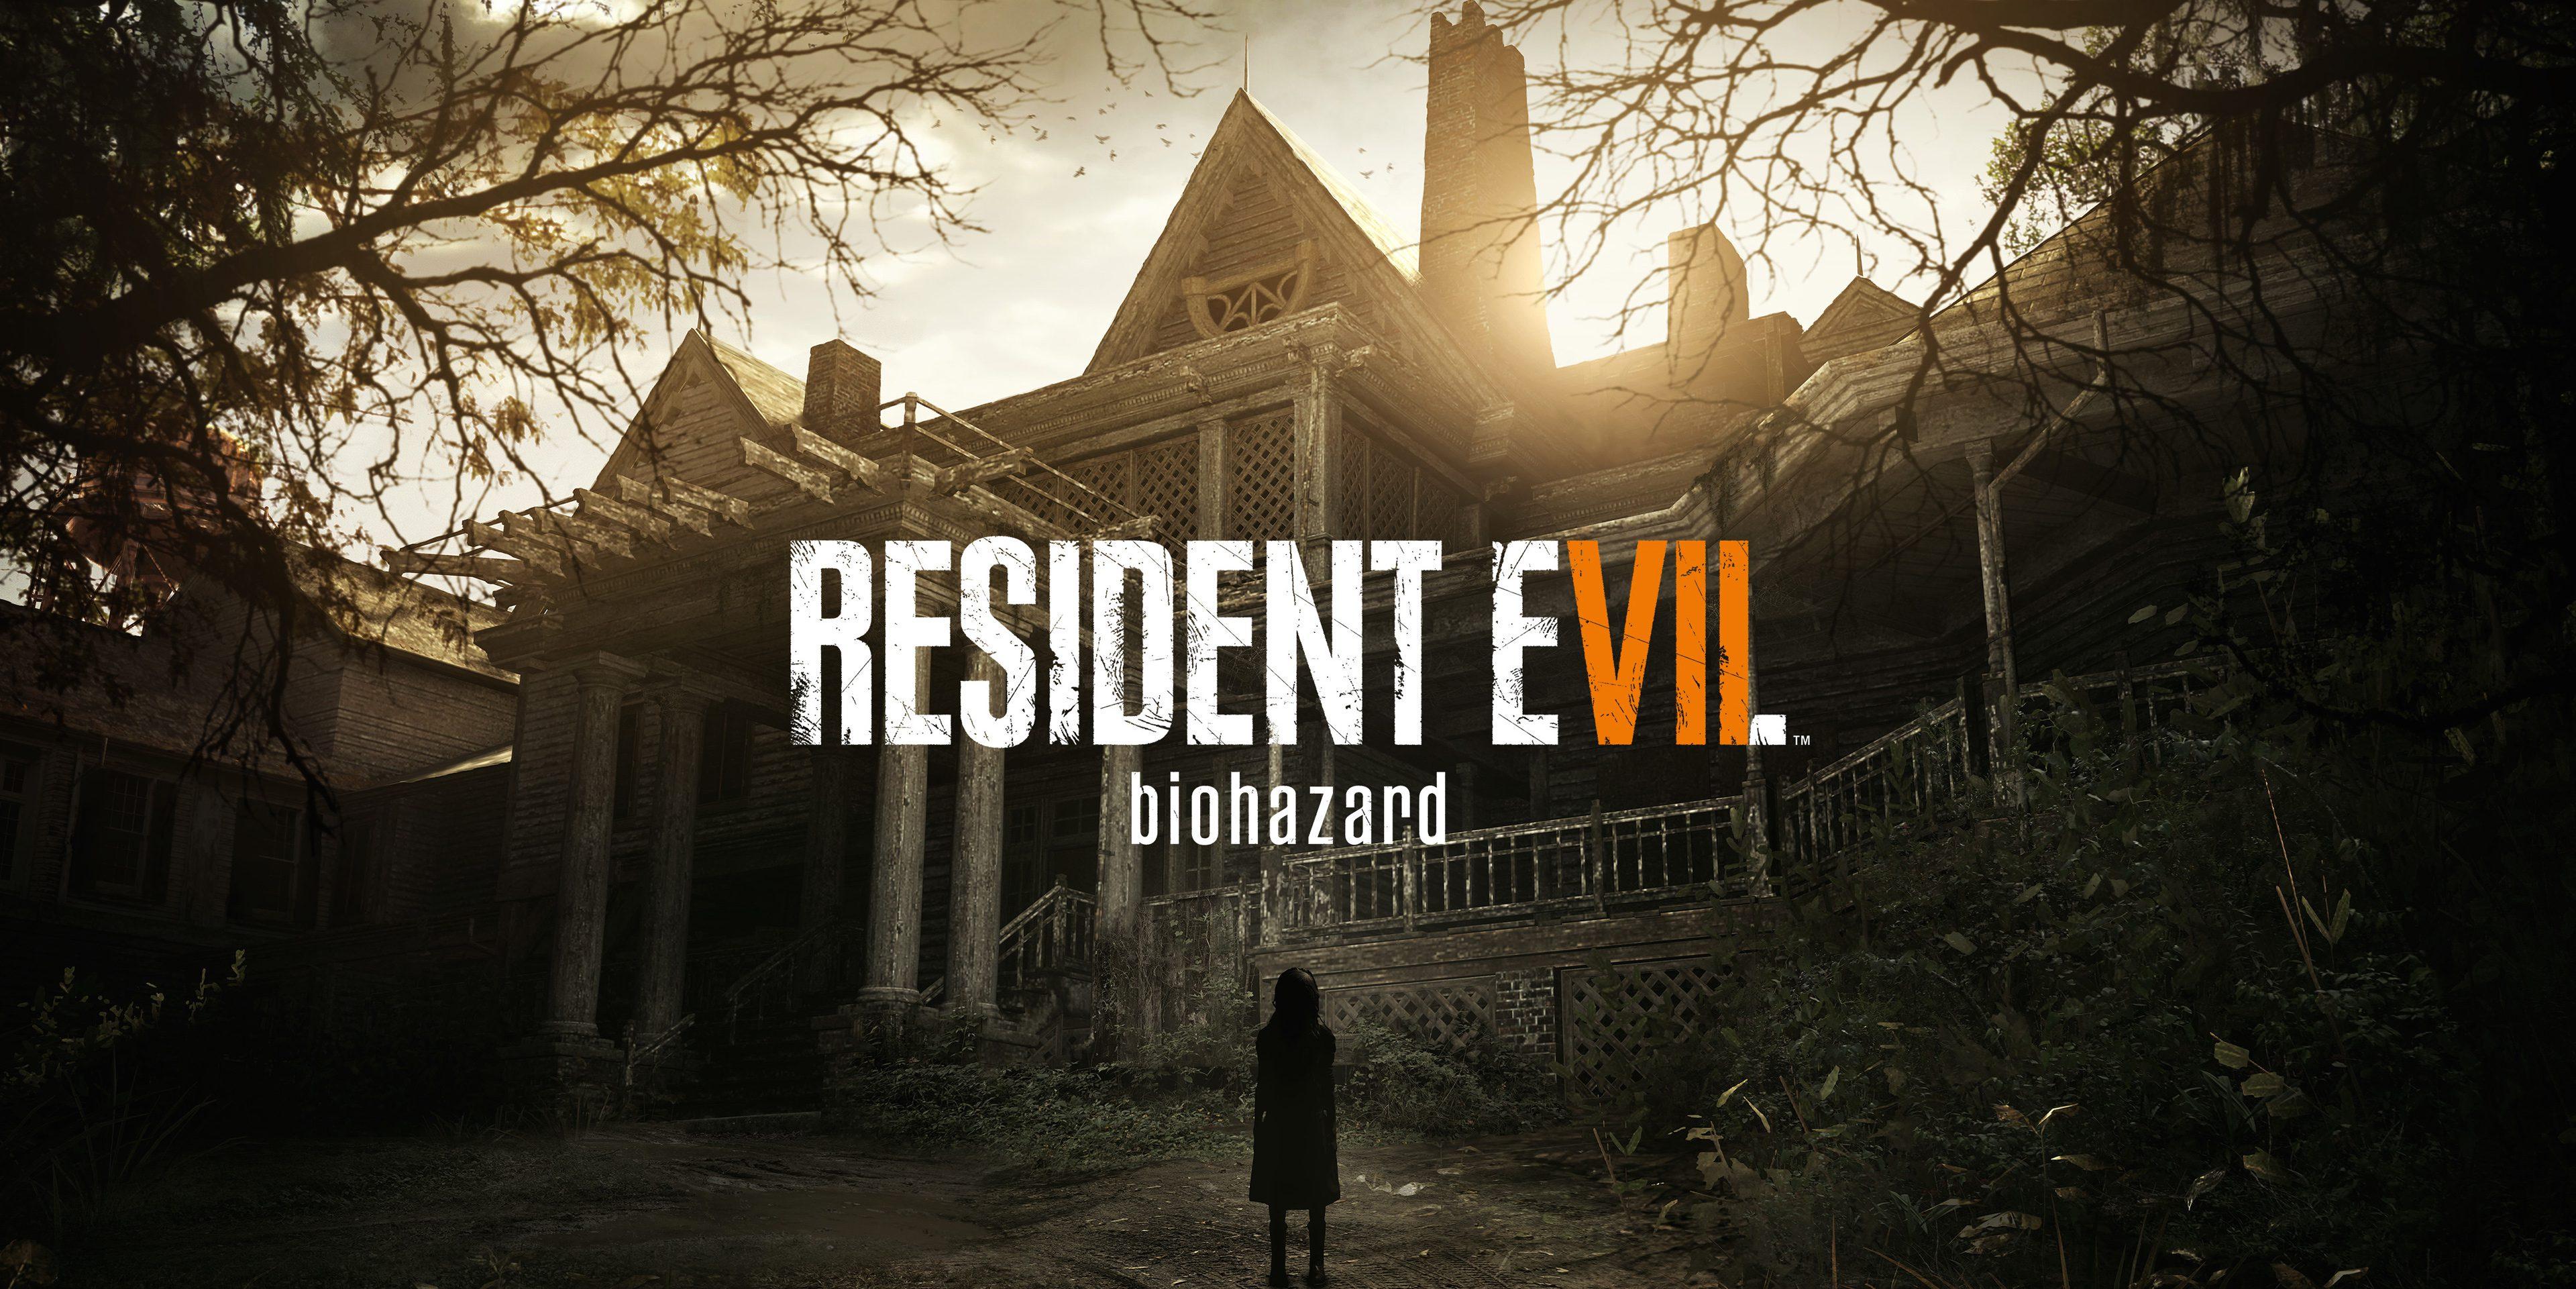 resident-evil-7-biohazard-sale-01